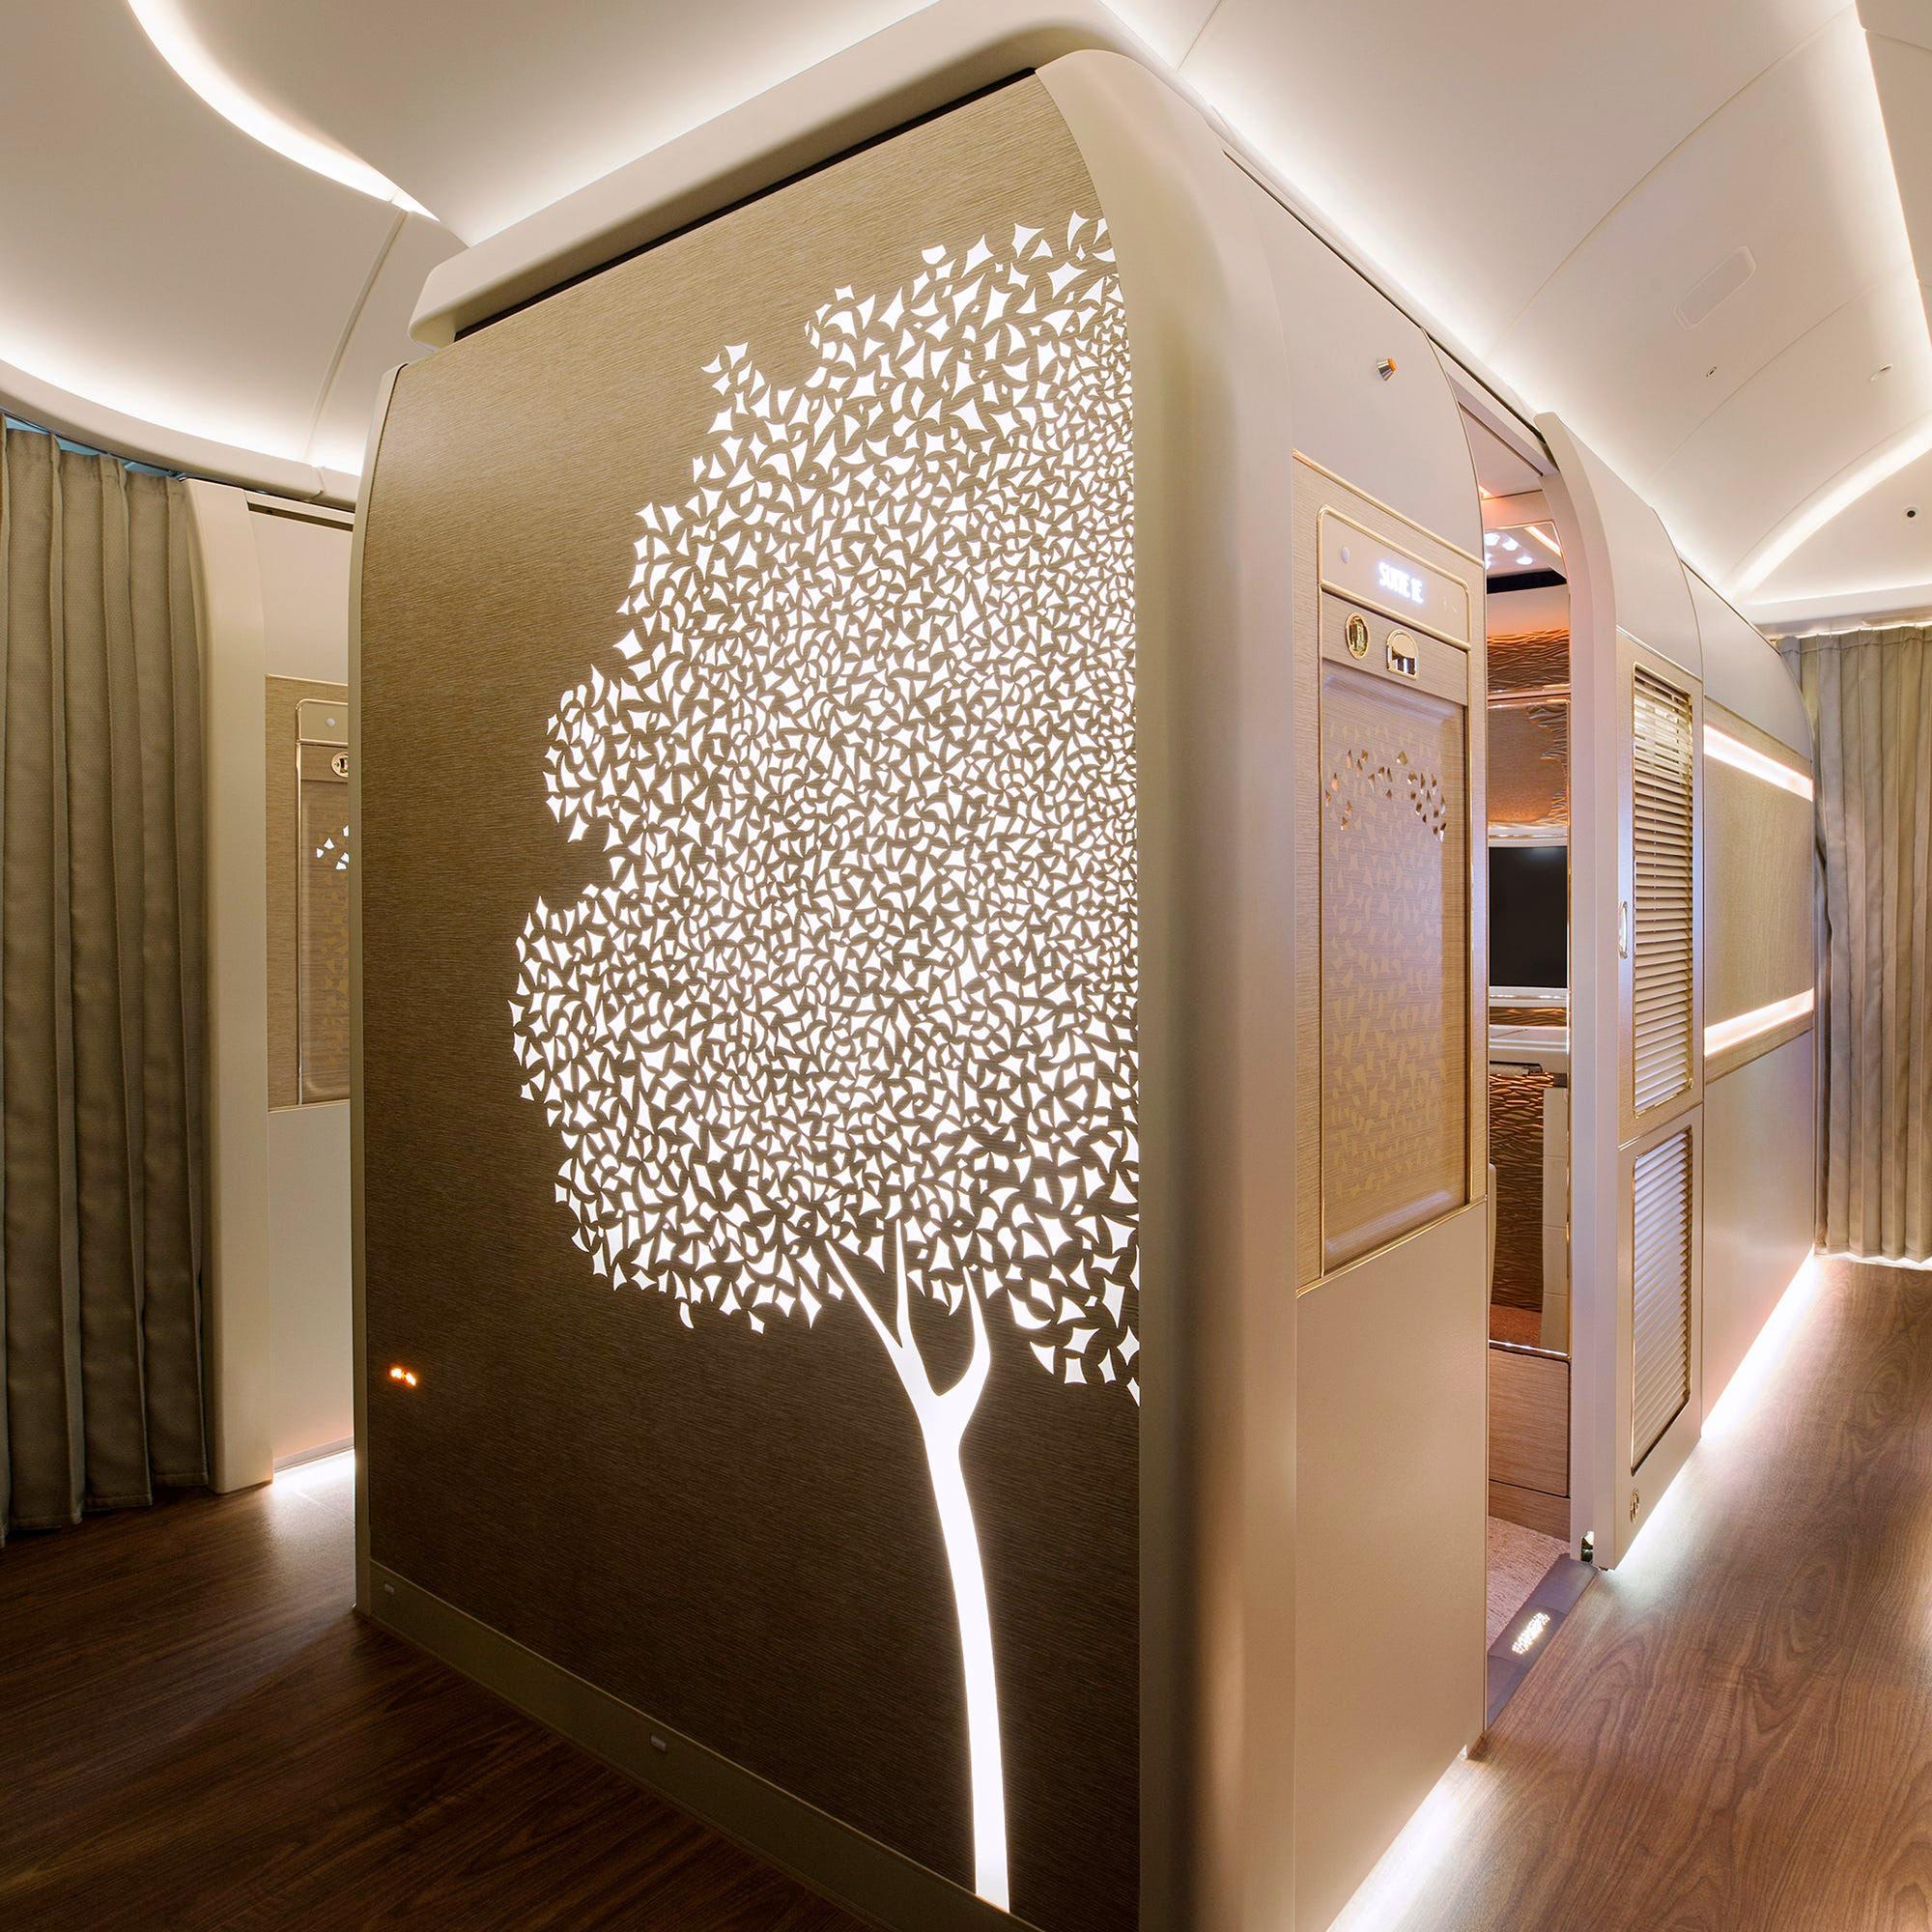 EK New First Ghaf Tree 2 (Emirates)